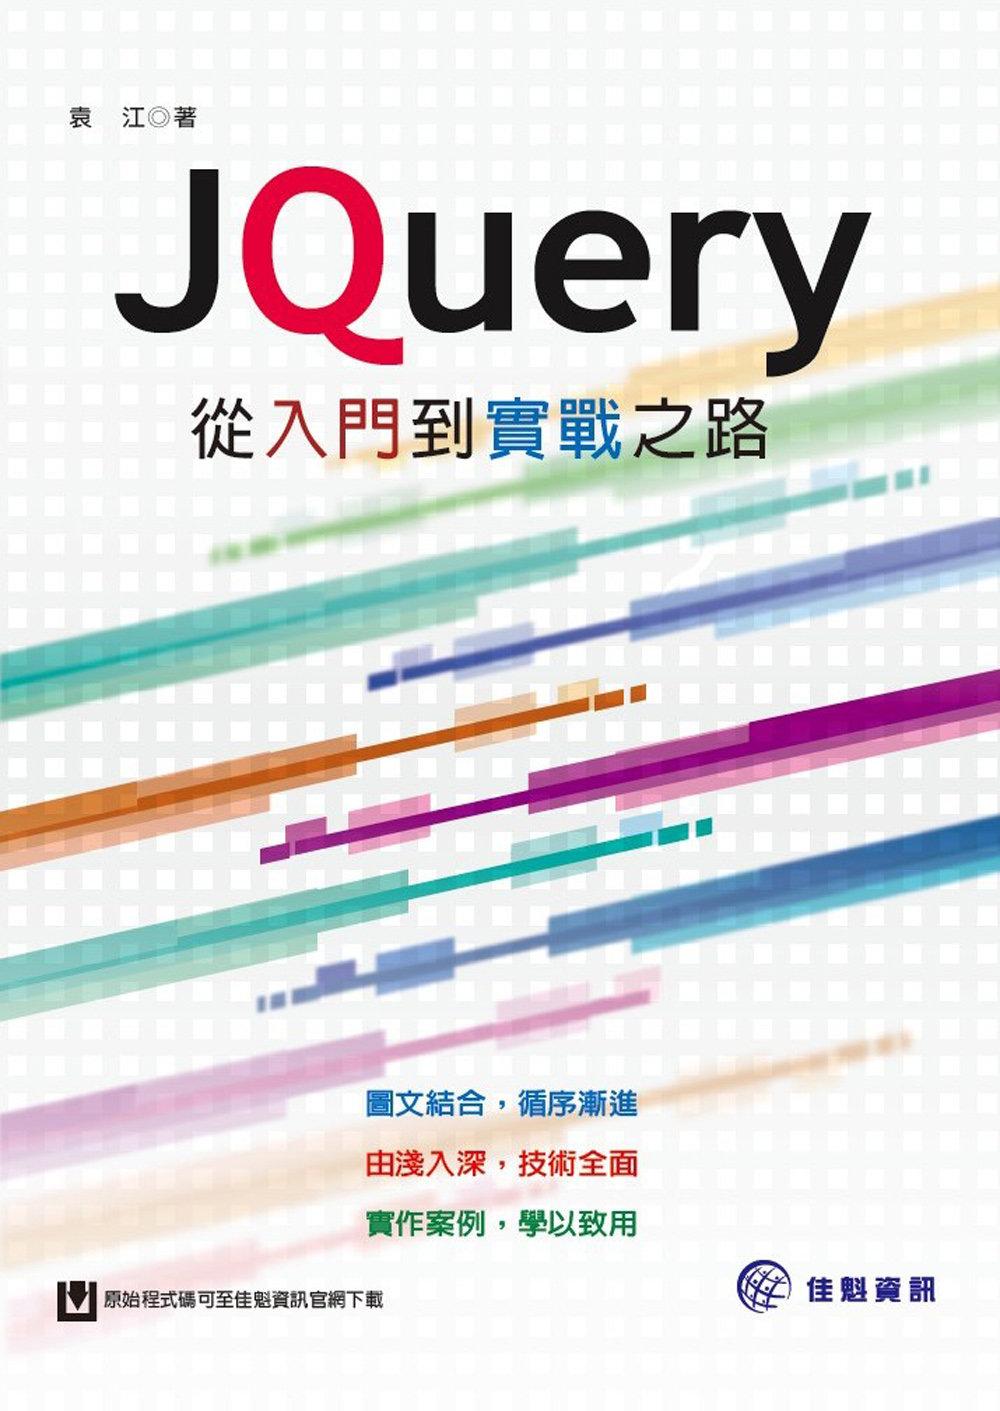 JQuery 從入門到實戰之路 (舊名: 王者歸來 : jQuery開發權威指南)-preview-1